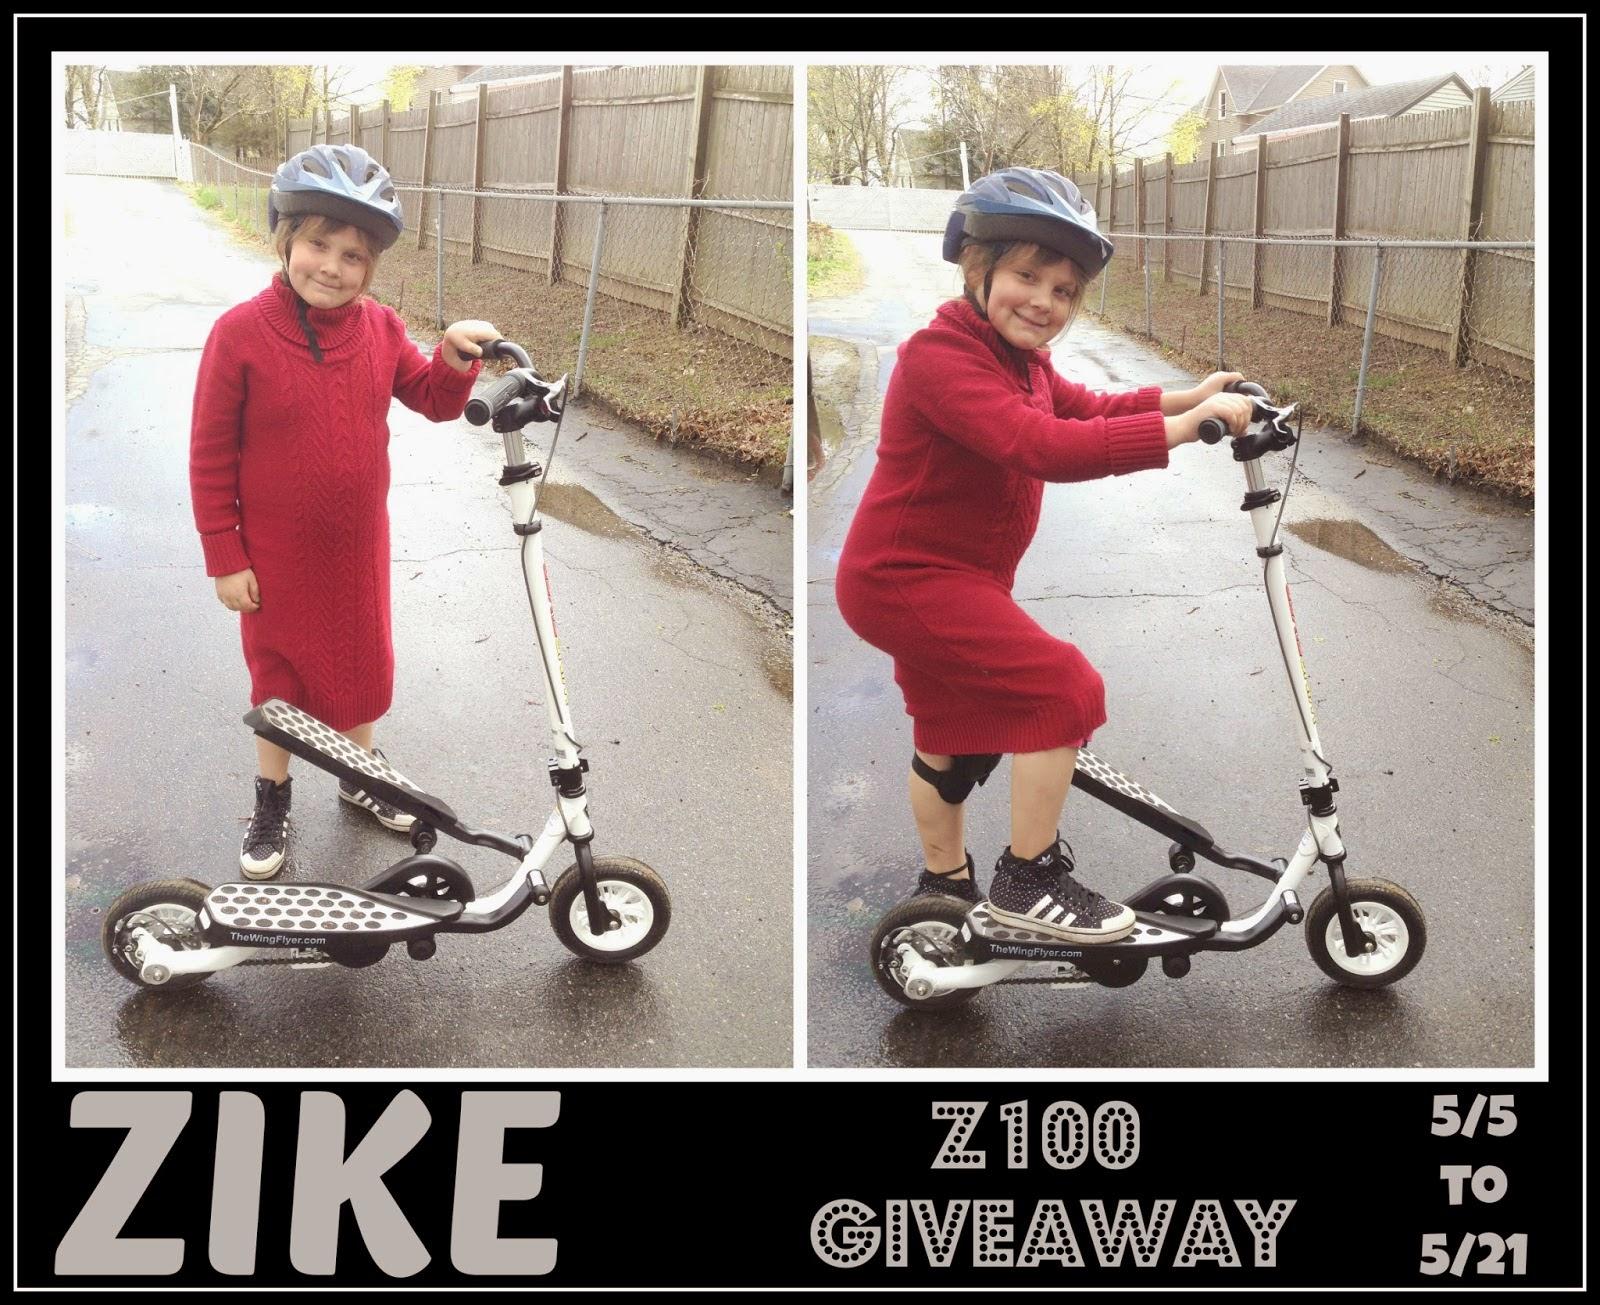 Zike Giveaway